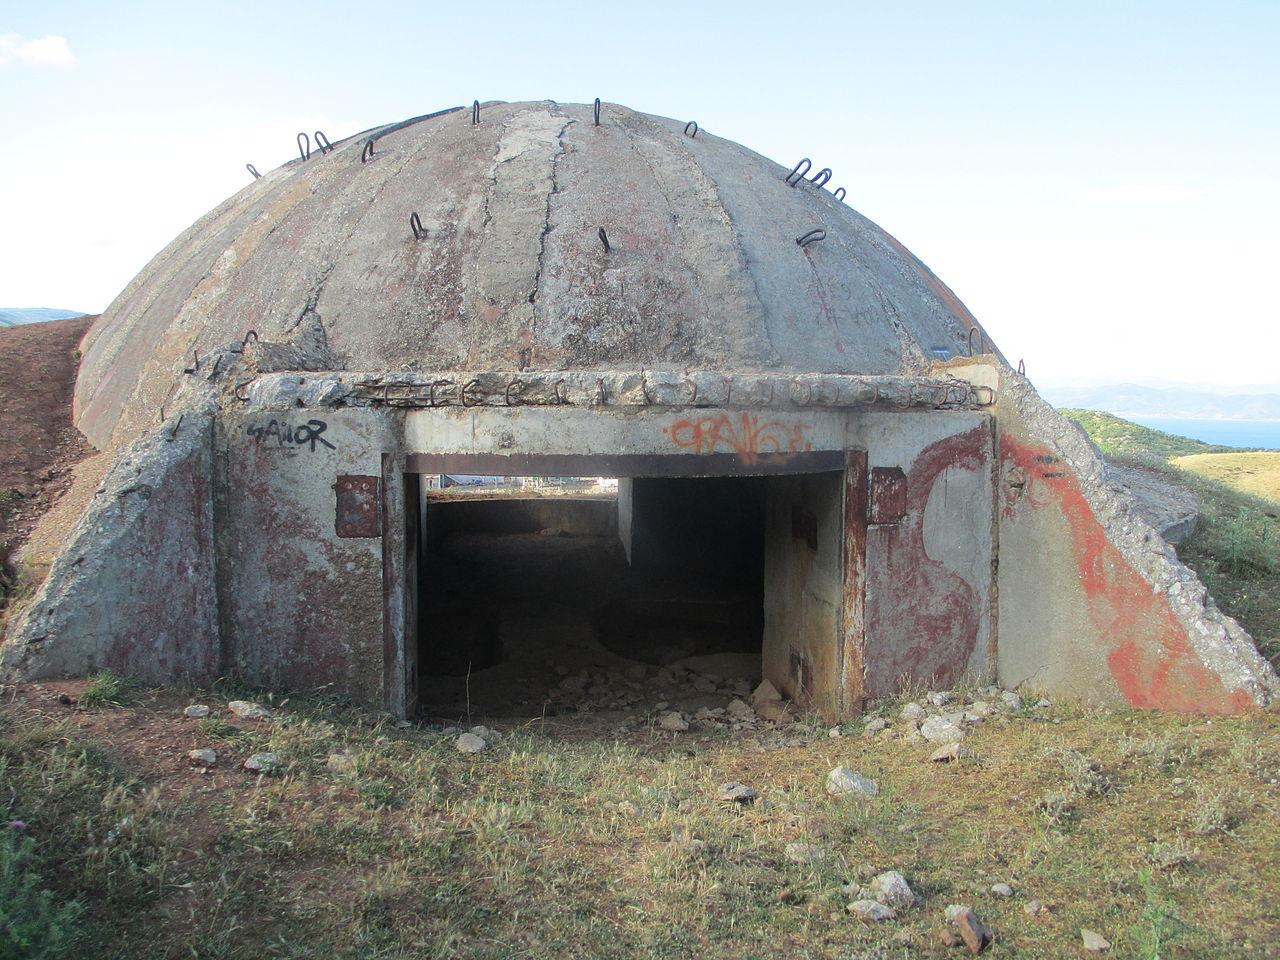 A_bunker_in_Albania,_near_Macedonia_border